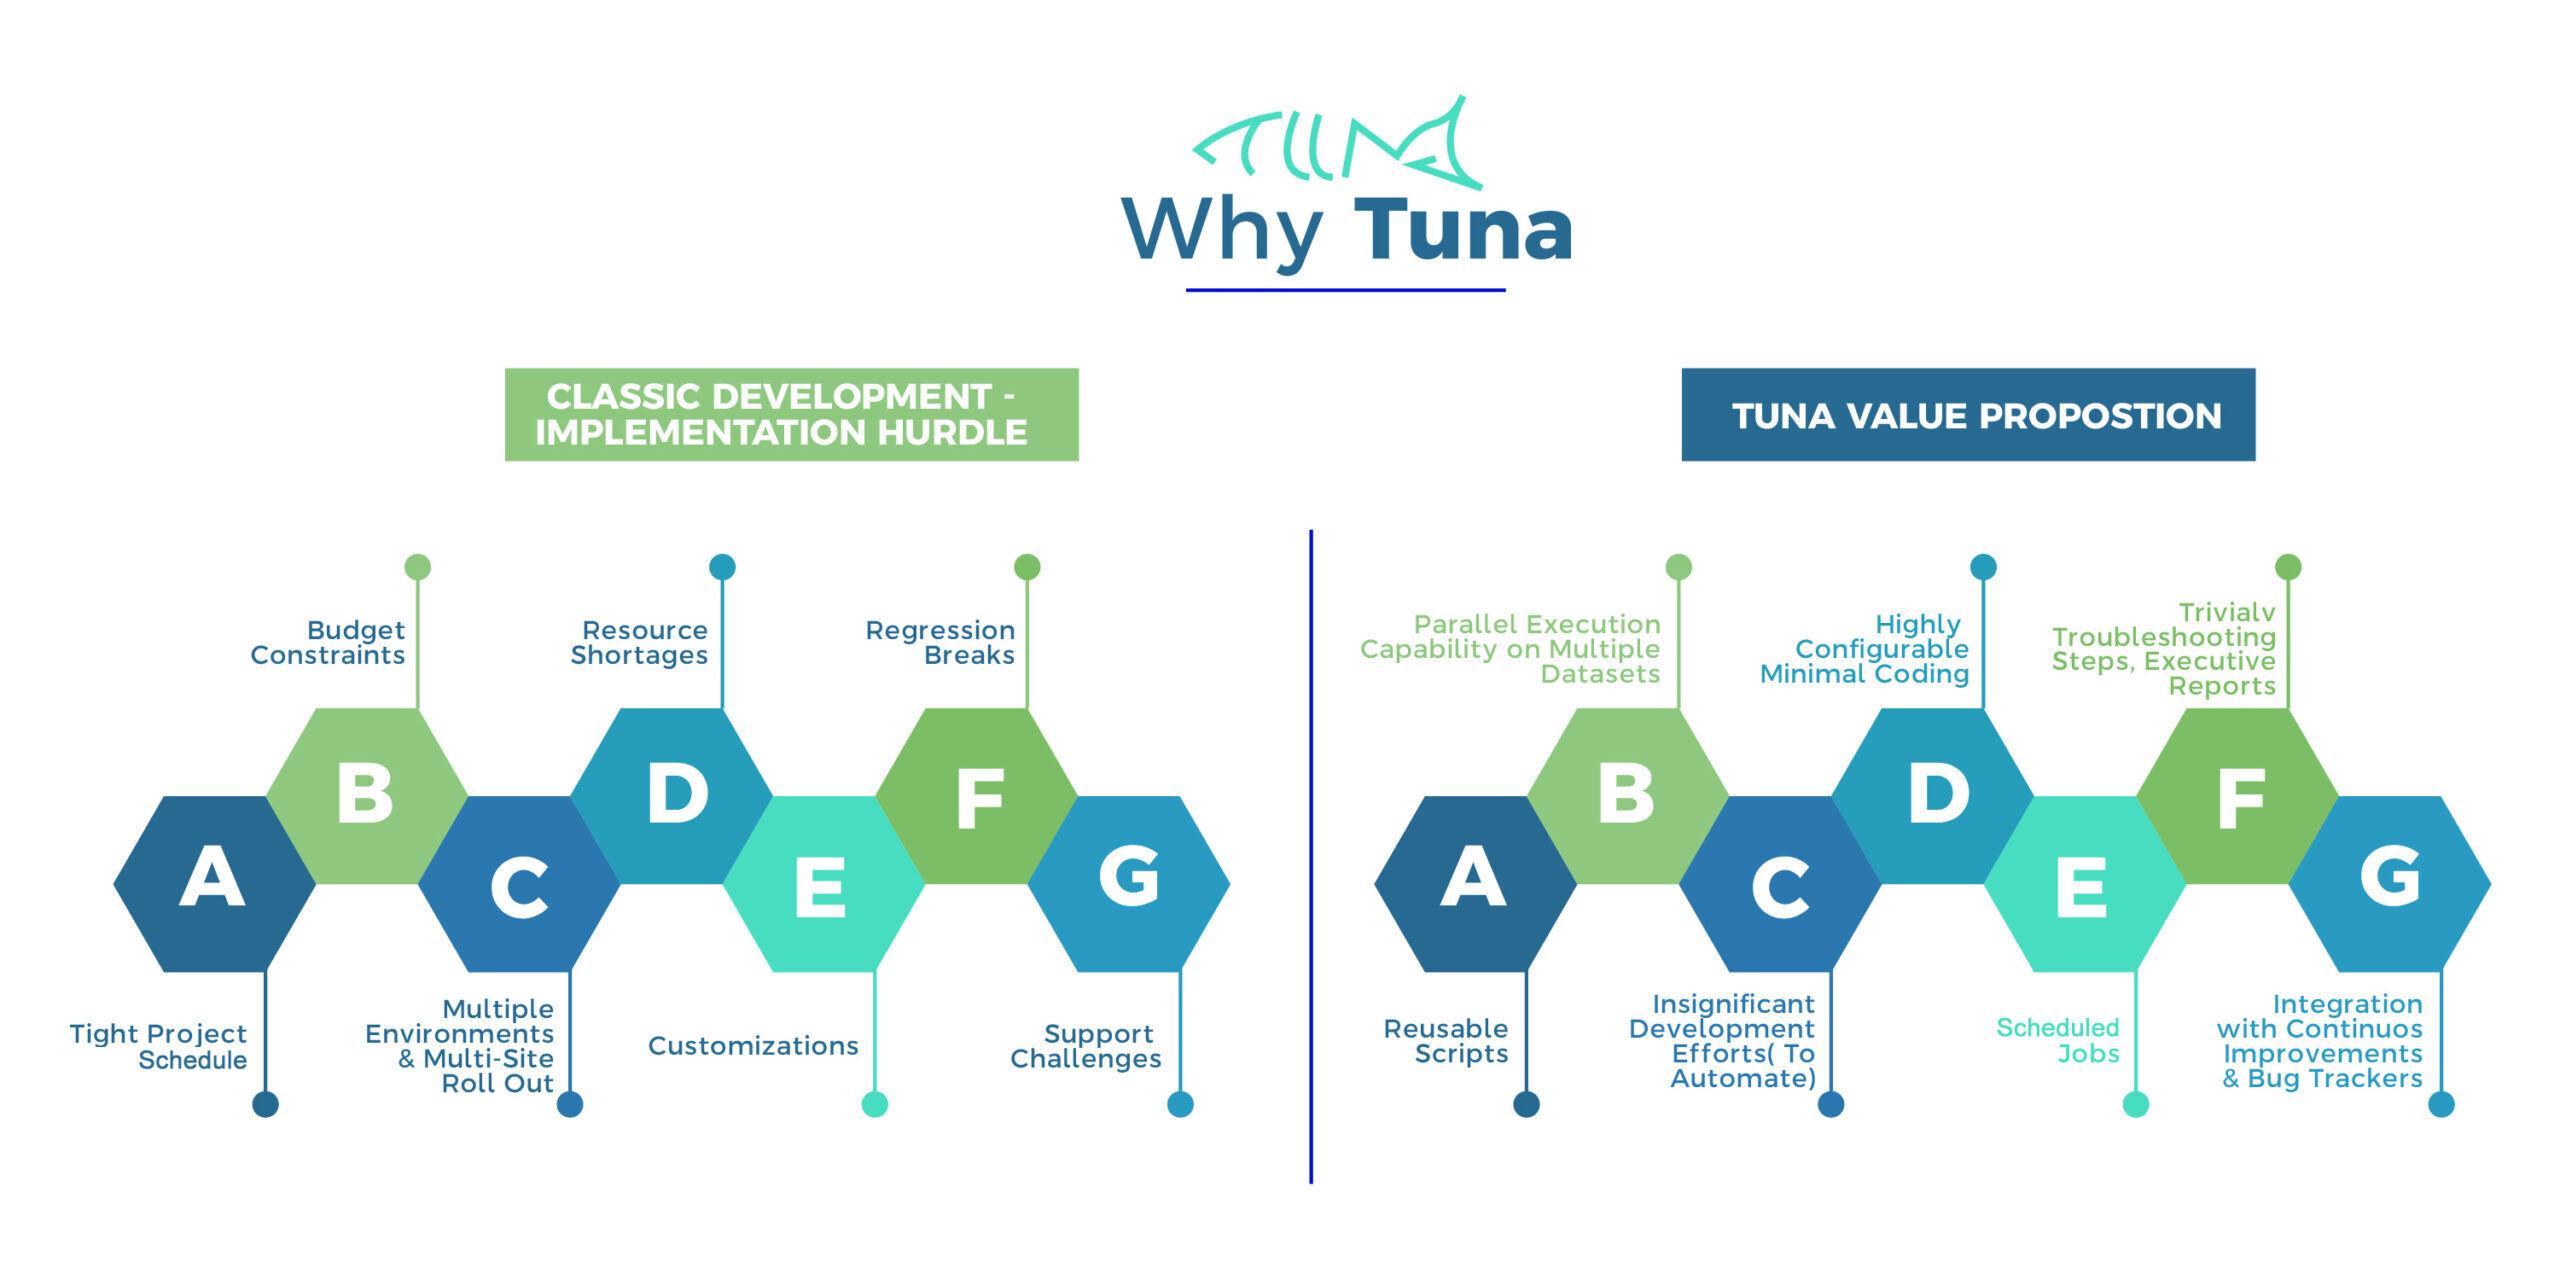 Tuna Automotive Transformation